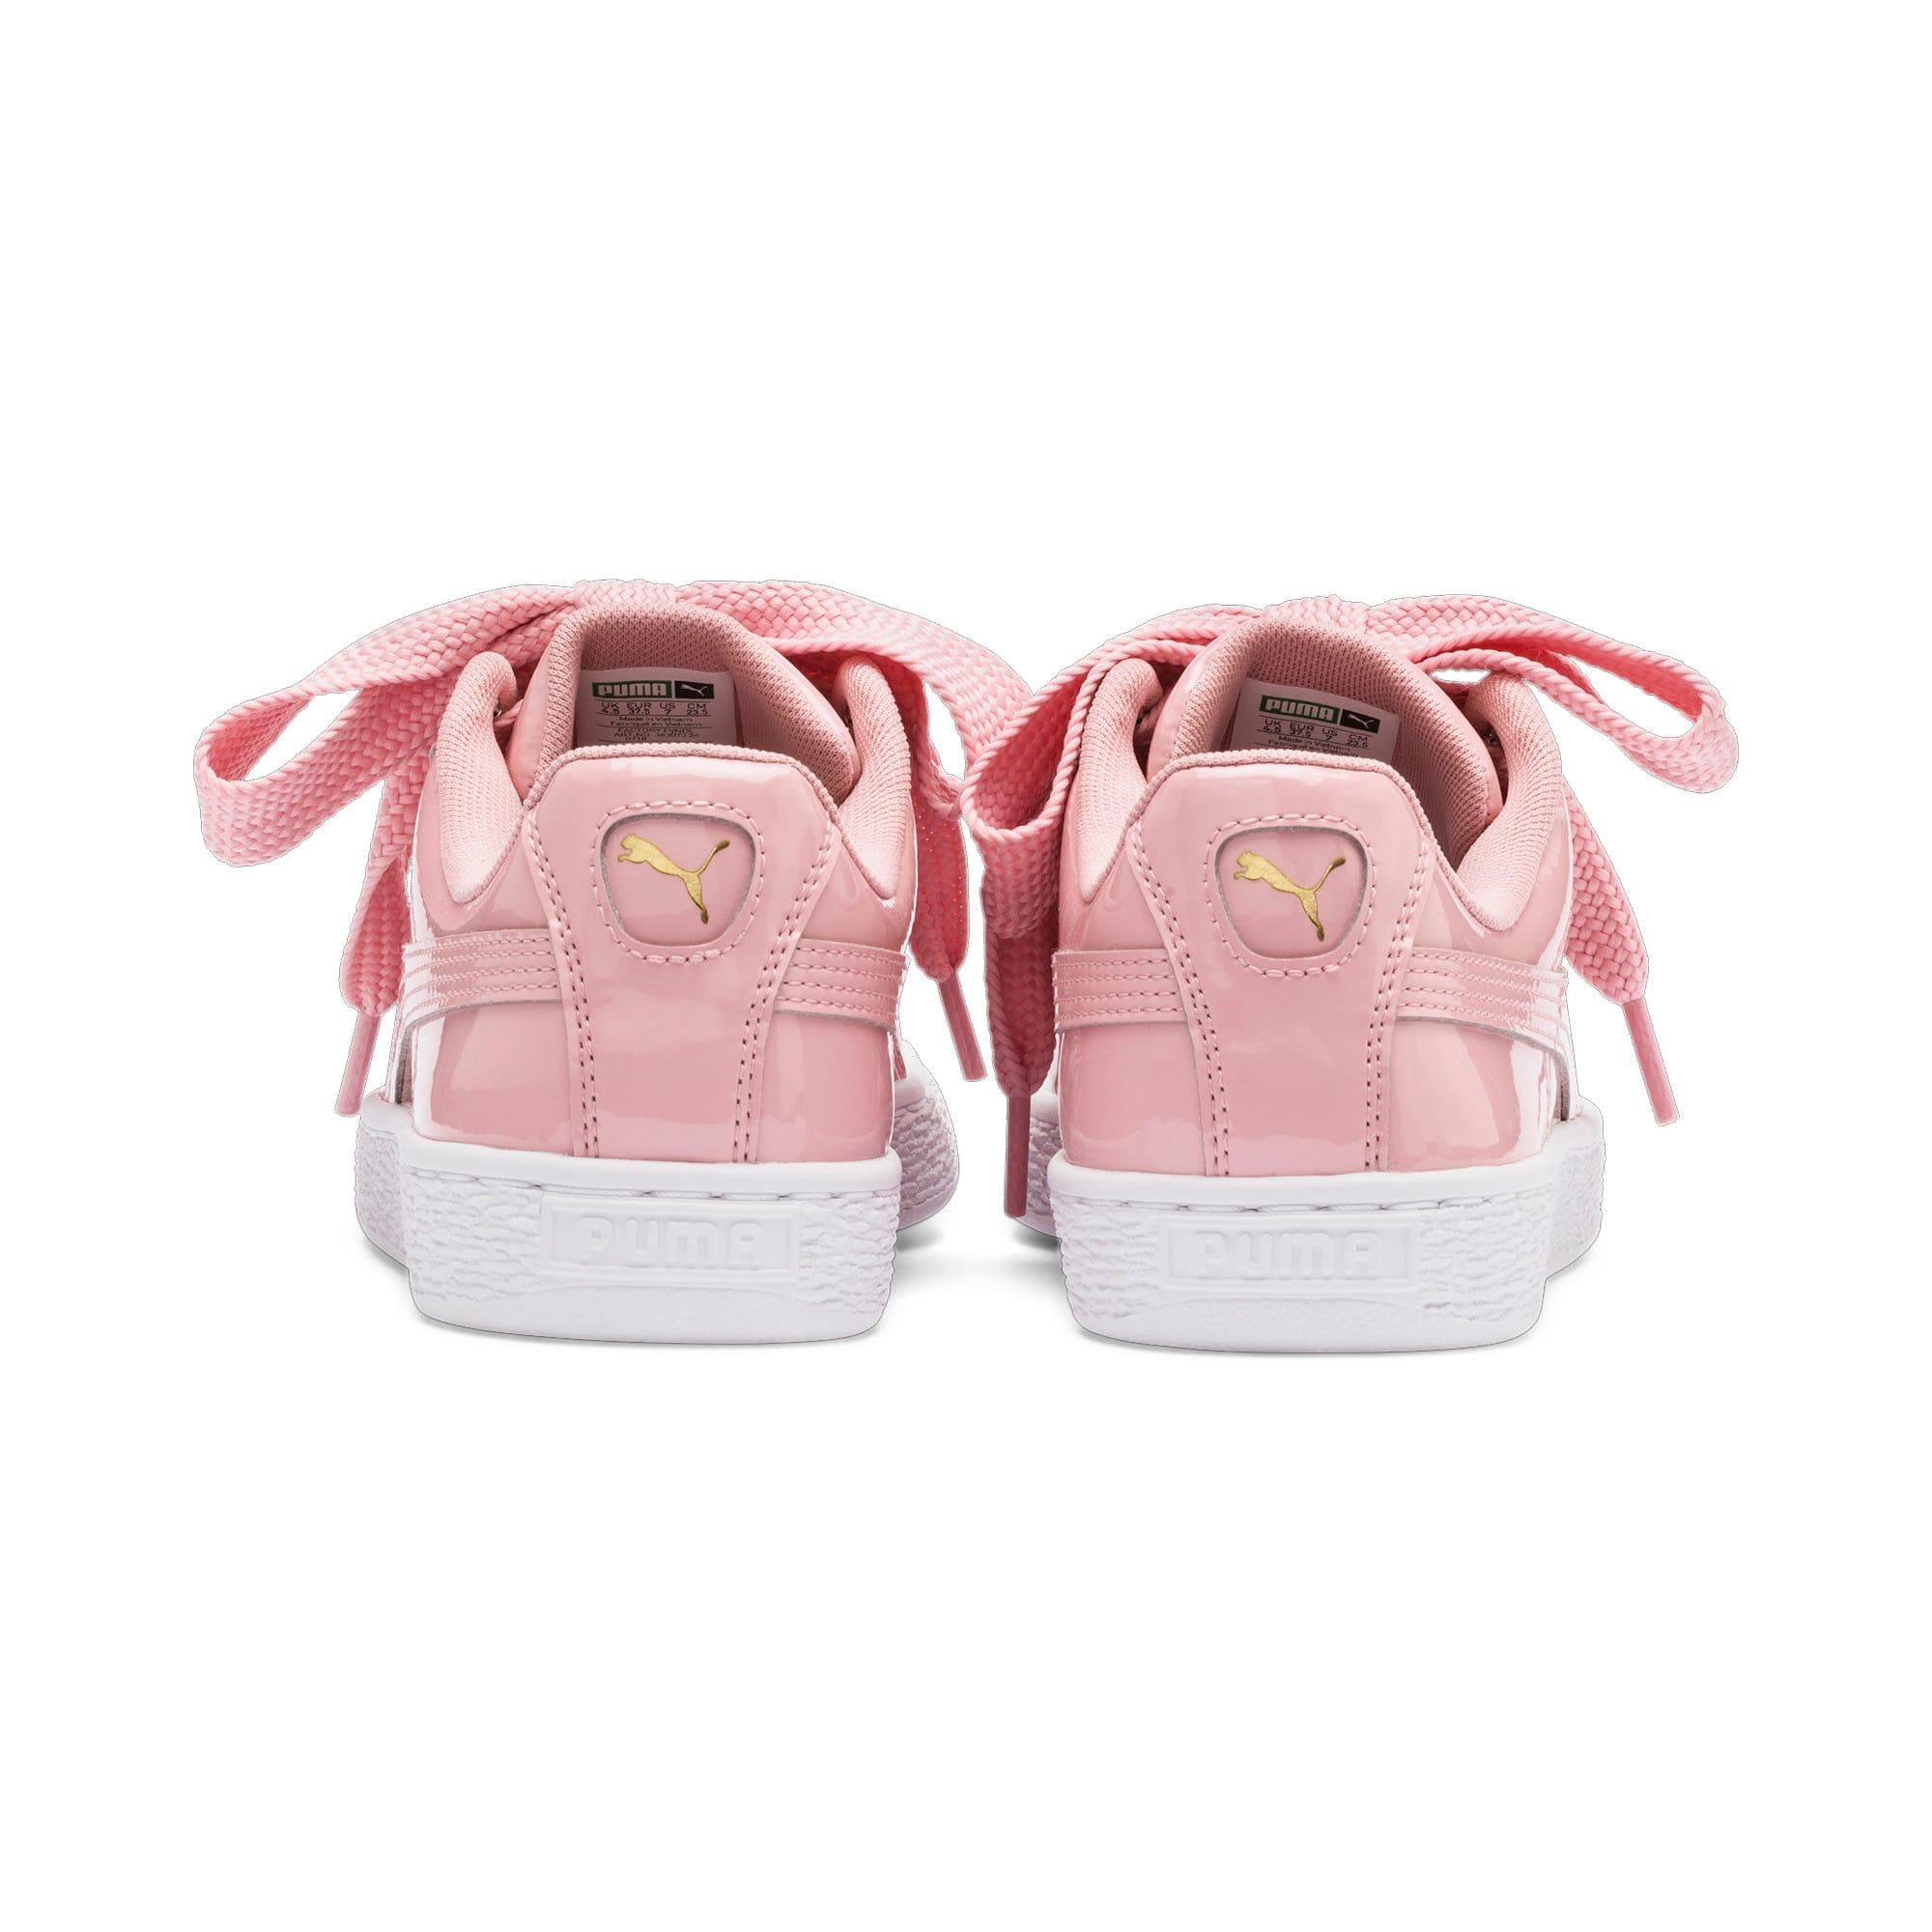 Thumbnail 4 of Basket Heart Patent Women's Sneakers, Bridal Rose-Puma Team Gold, medium